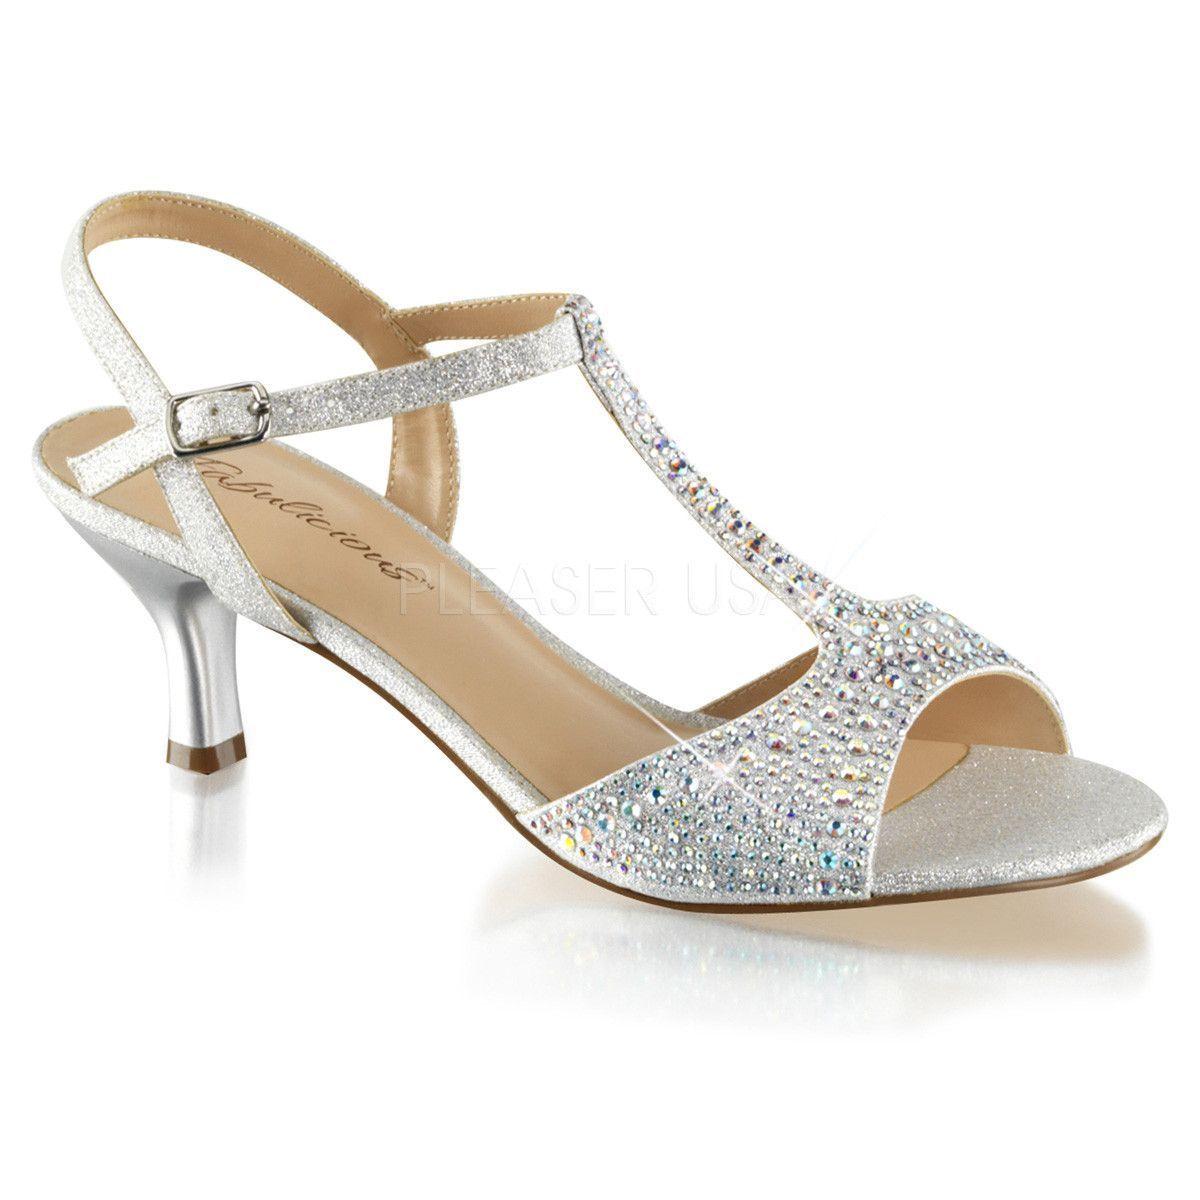 af0245f0e Silver Rhinestone Low Kitten Heels Ballroom Vintage Bridal Flapper Shoes 6  7 8 9 in Clothing